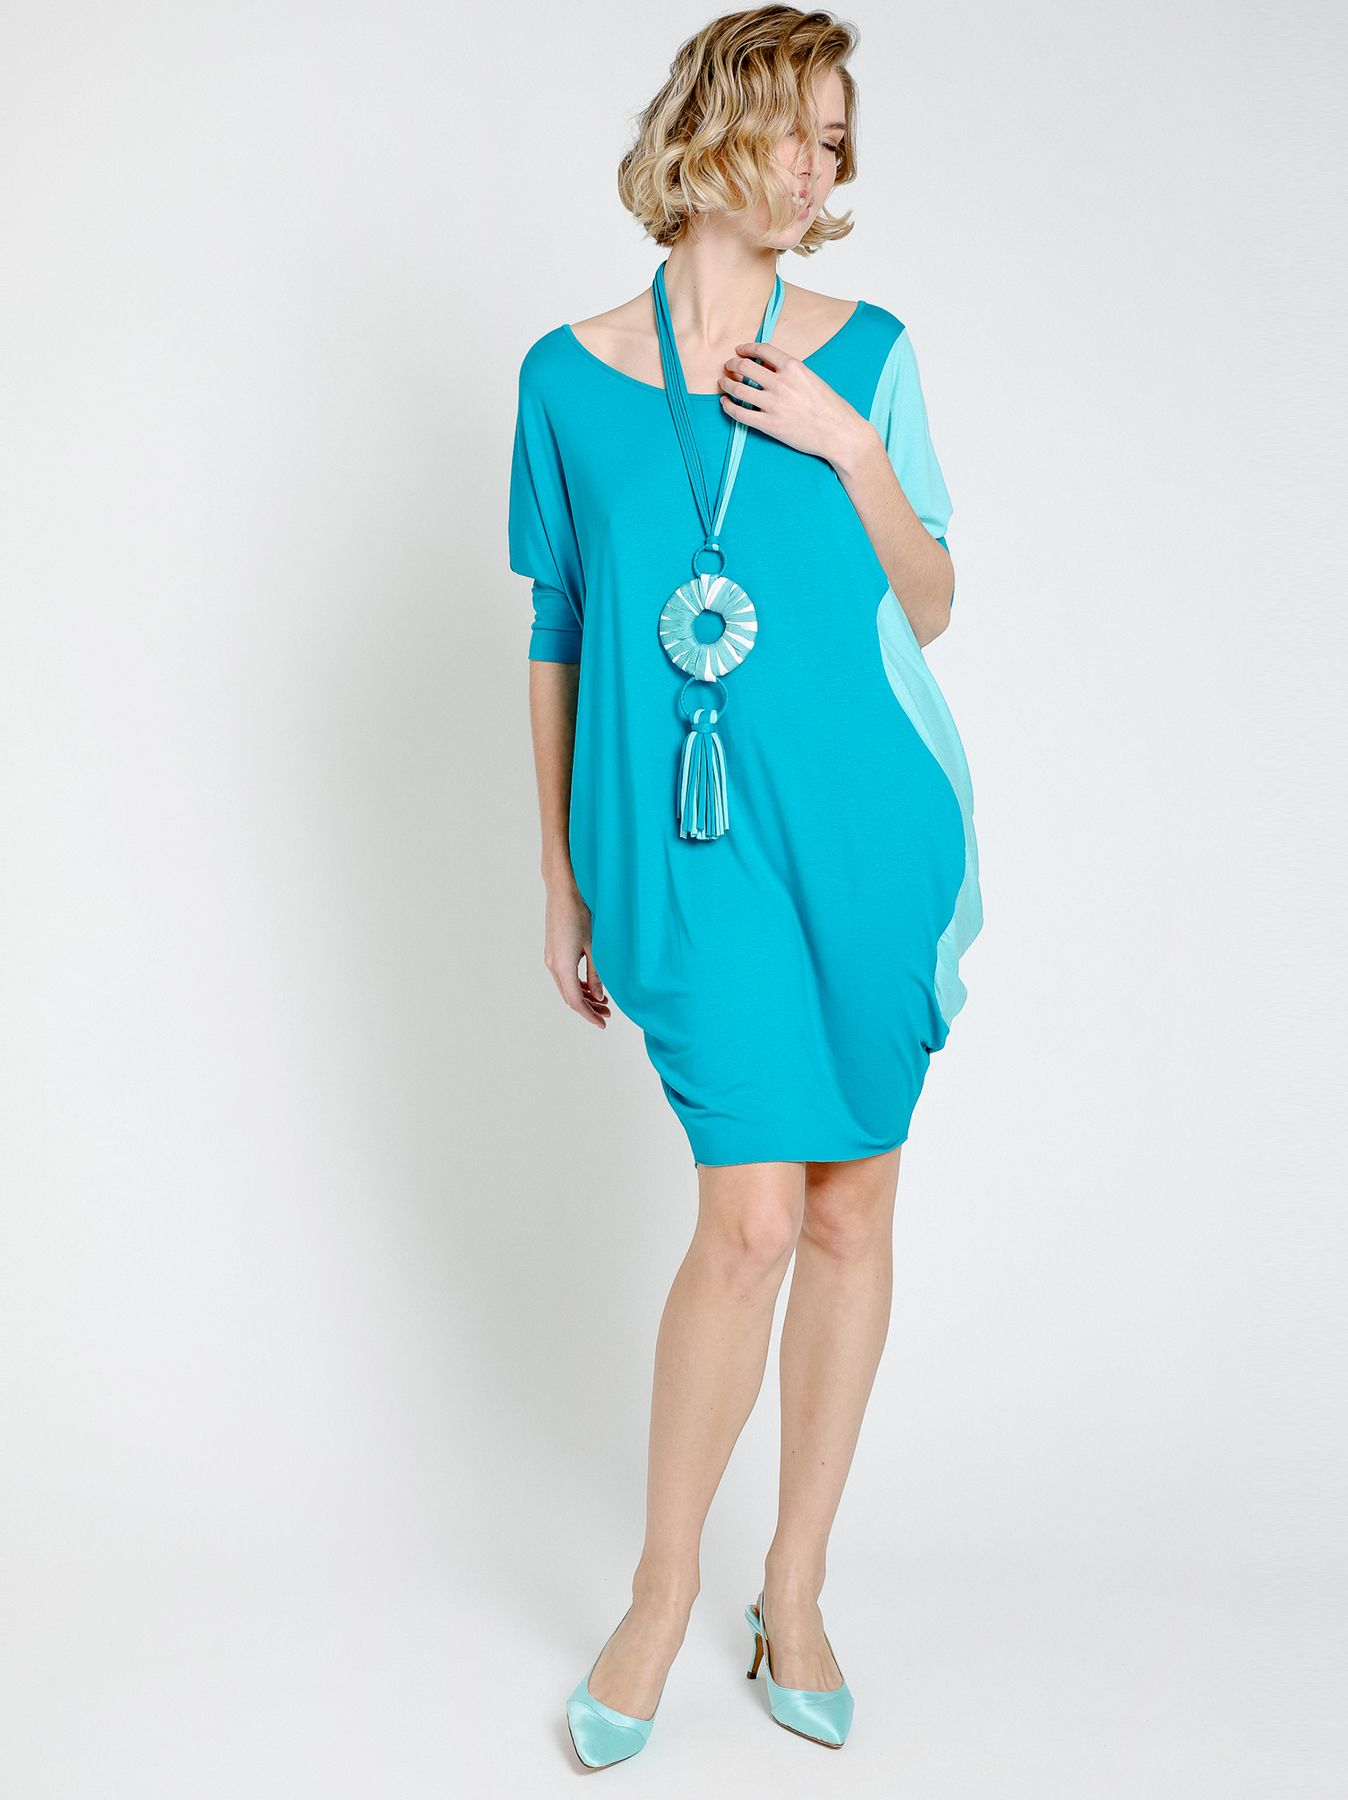 Bi-color over t-shirt dress